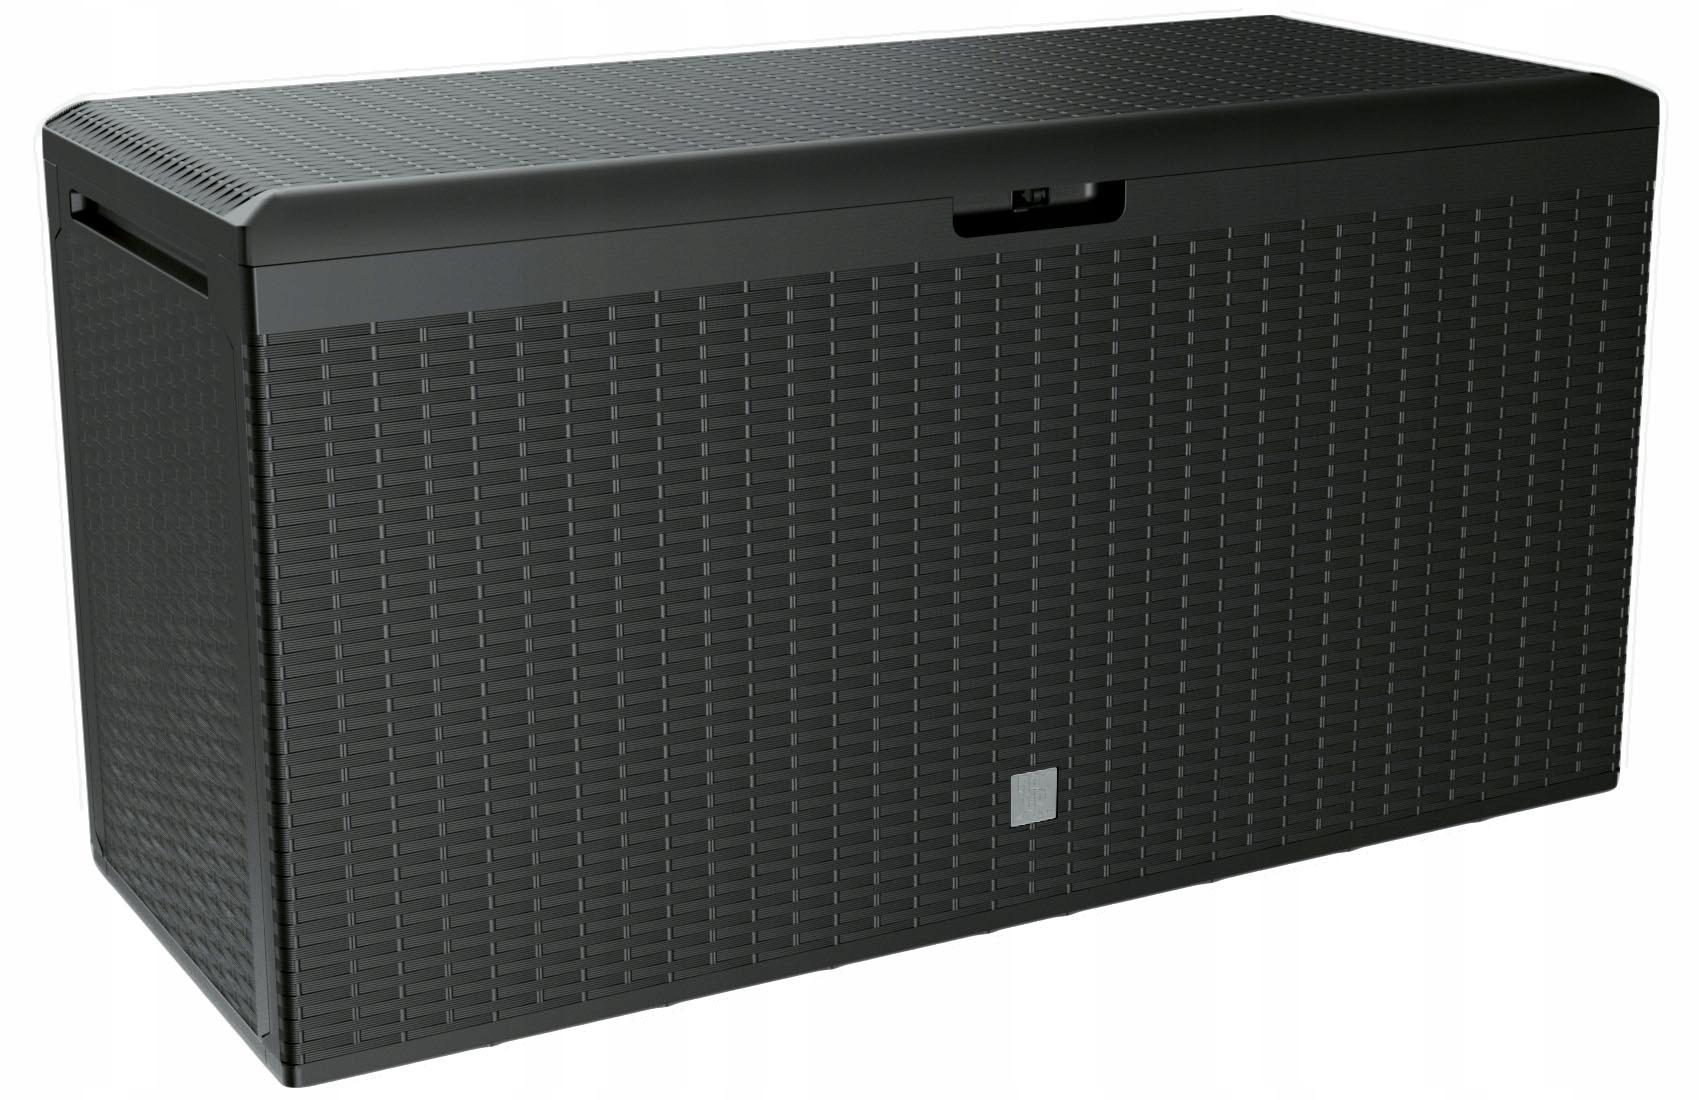 коробка для сада техноротанг Антрацит Сиденье